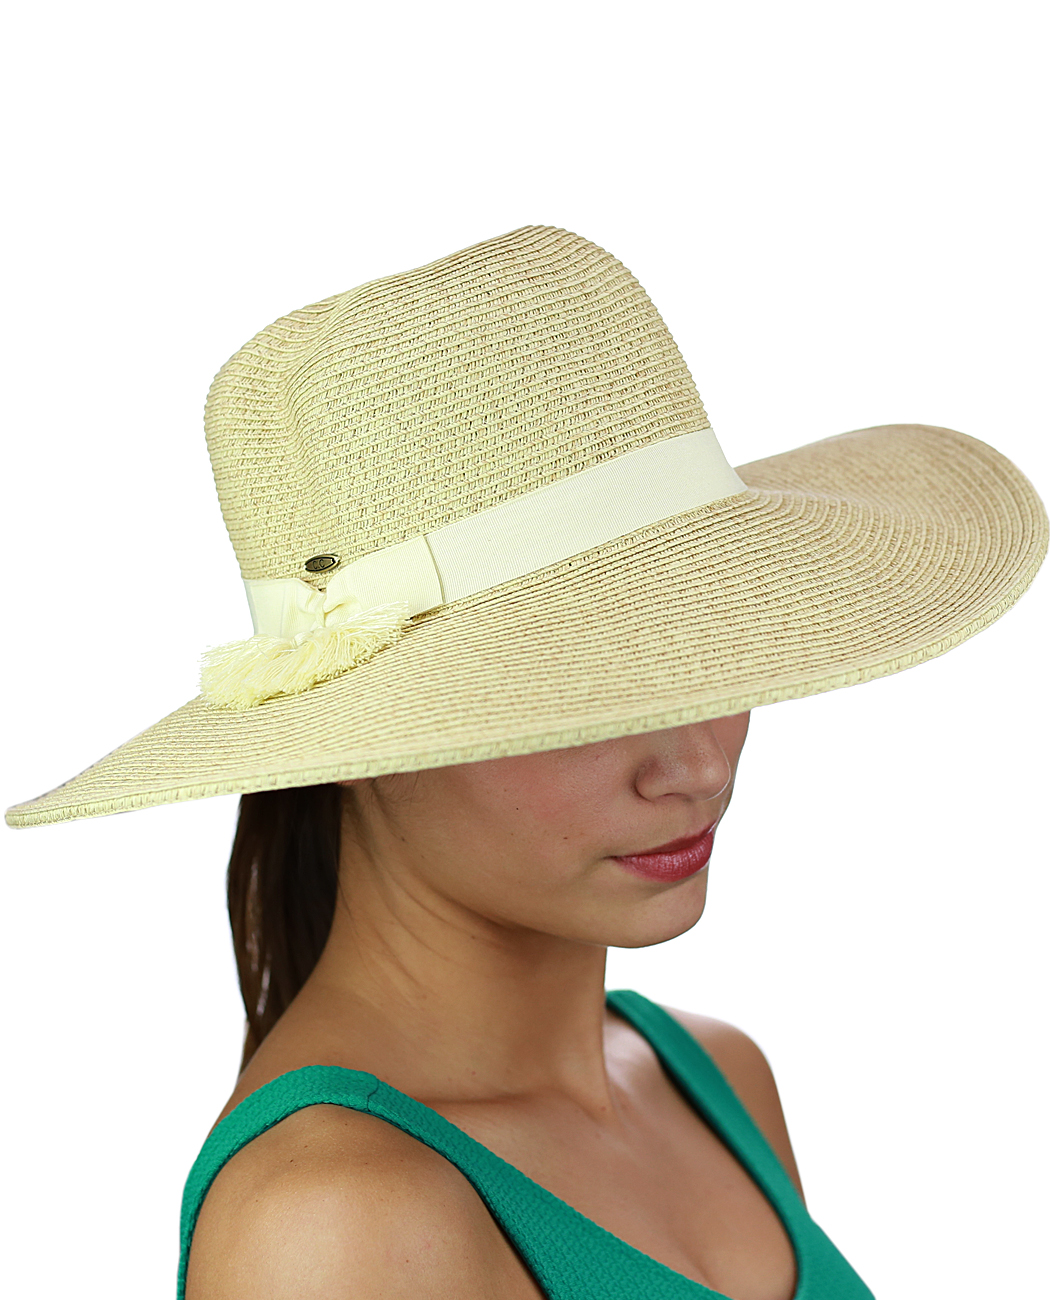 C.C Women's Solid Color Band with Tassel Summer Beach Floppy Brim Sun Hat, Sand